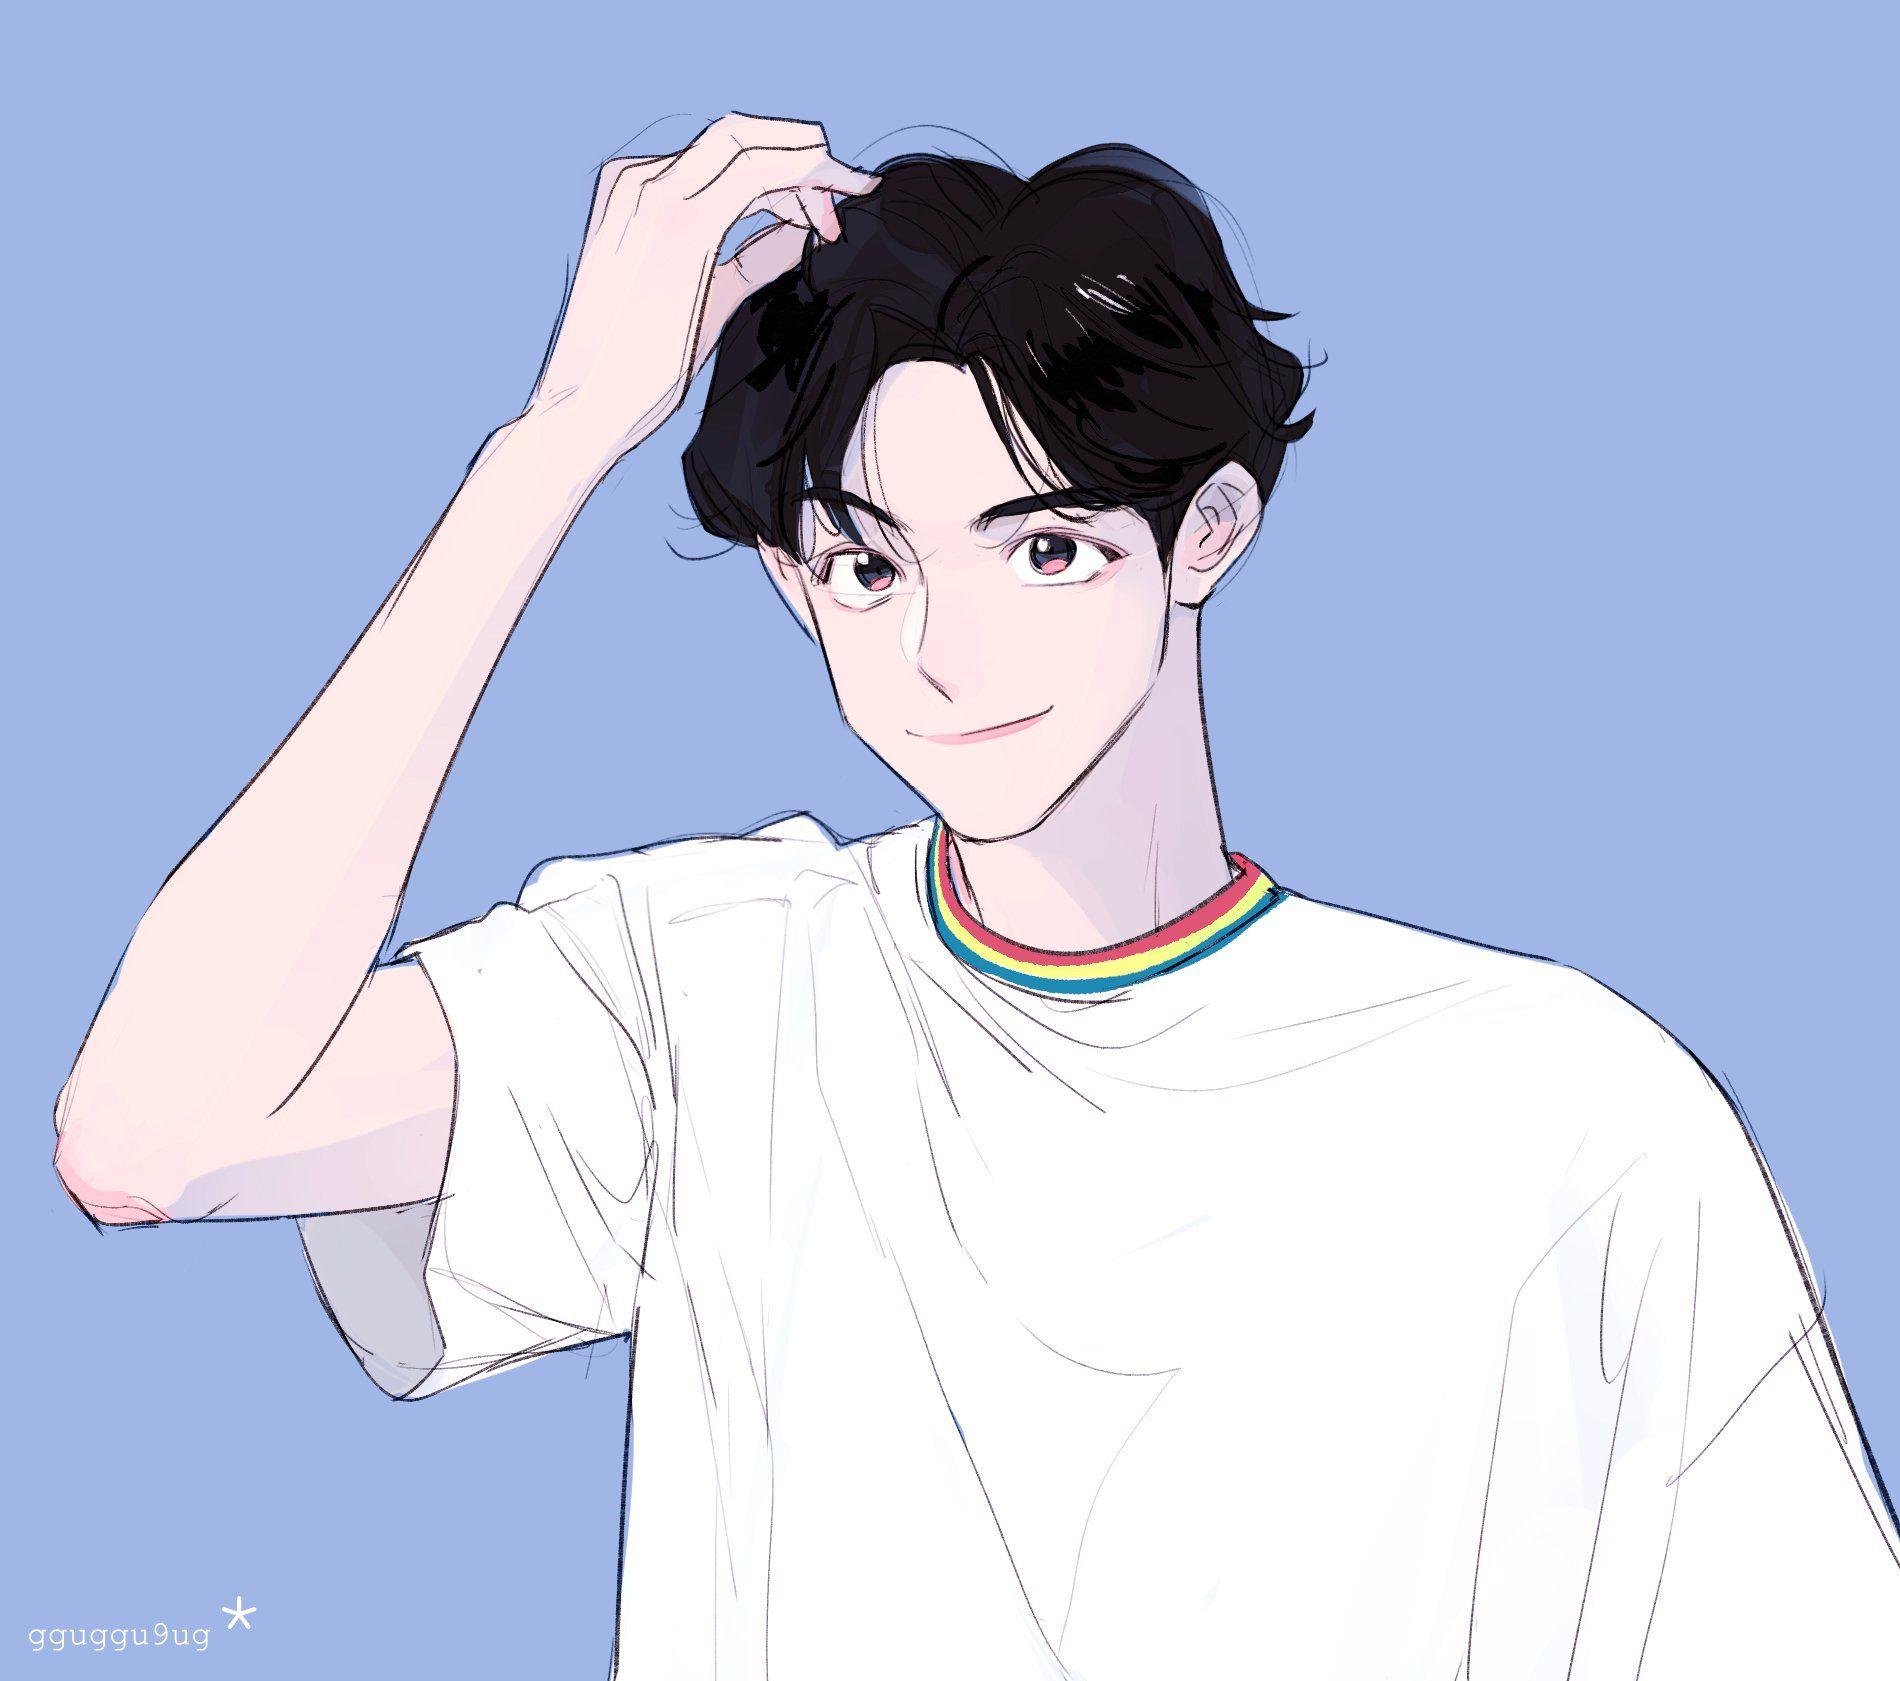 rest꾸국 on in 2020 Boy art, Anime art, Character art